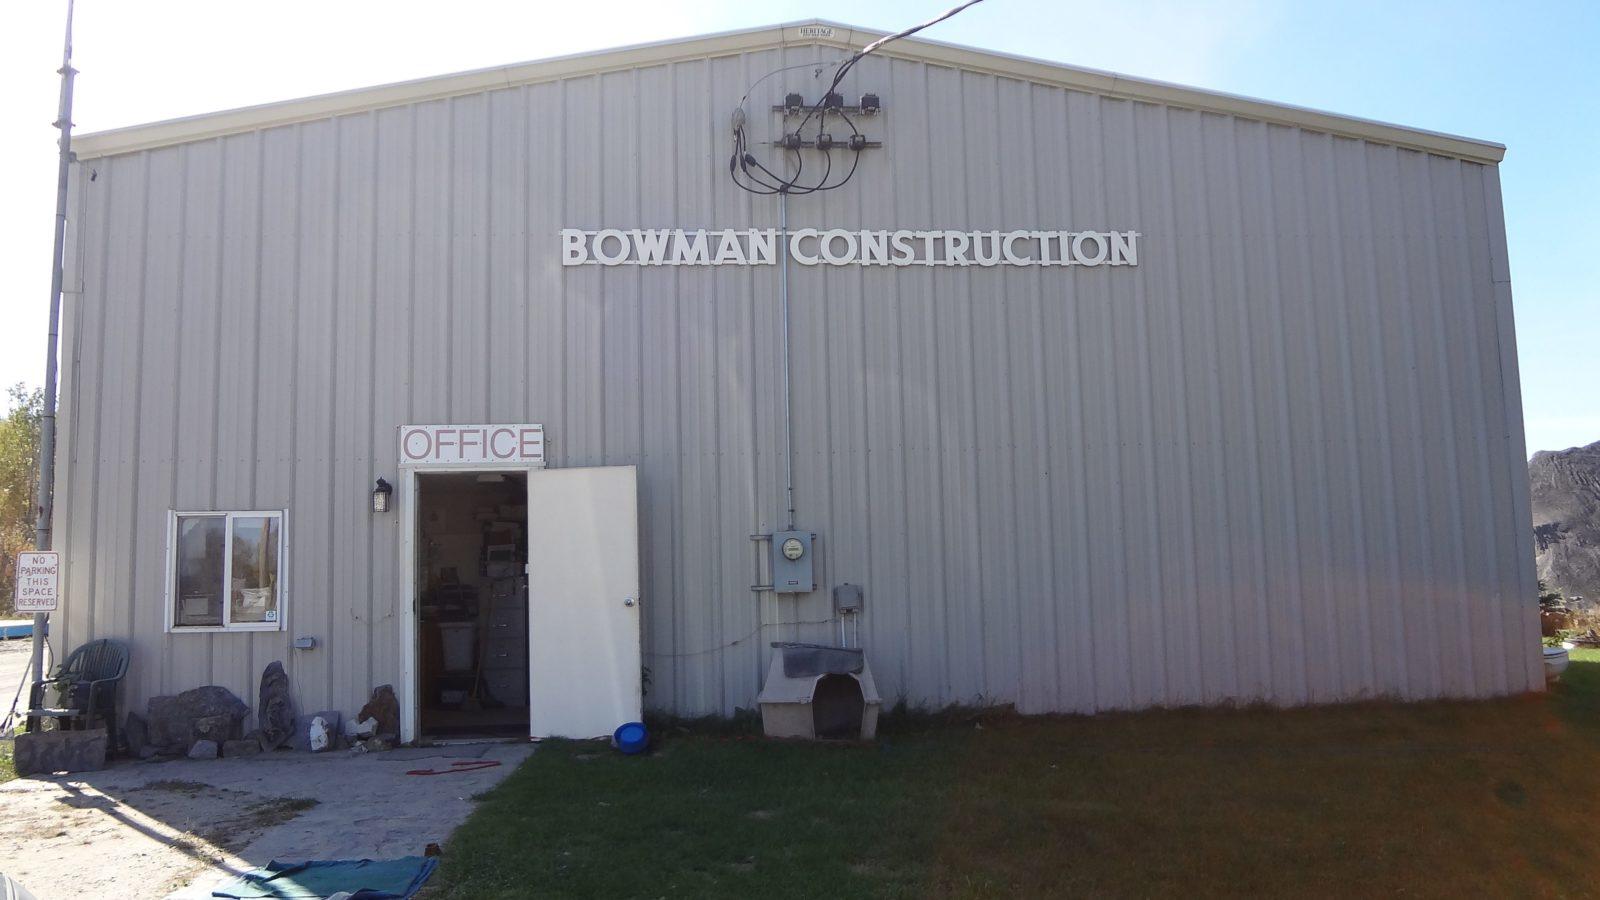 Bowman Construction exterior shot